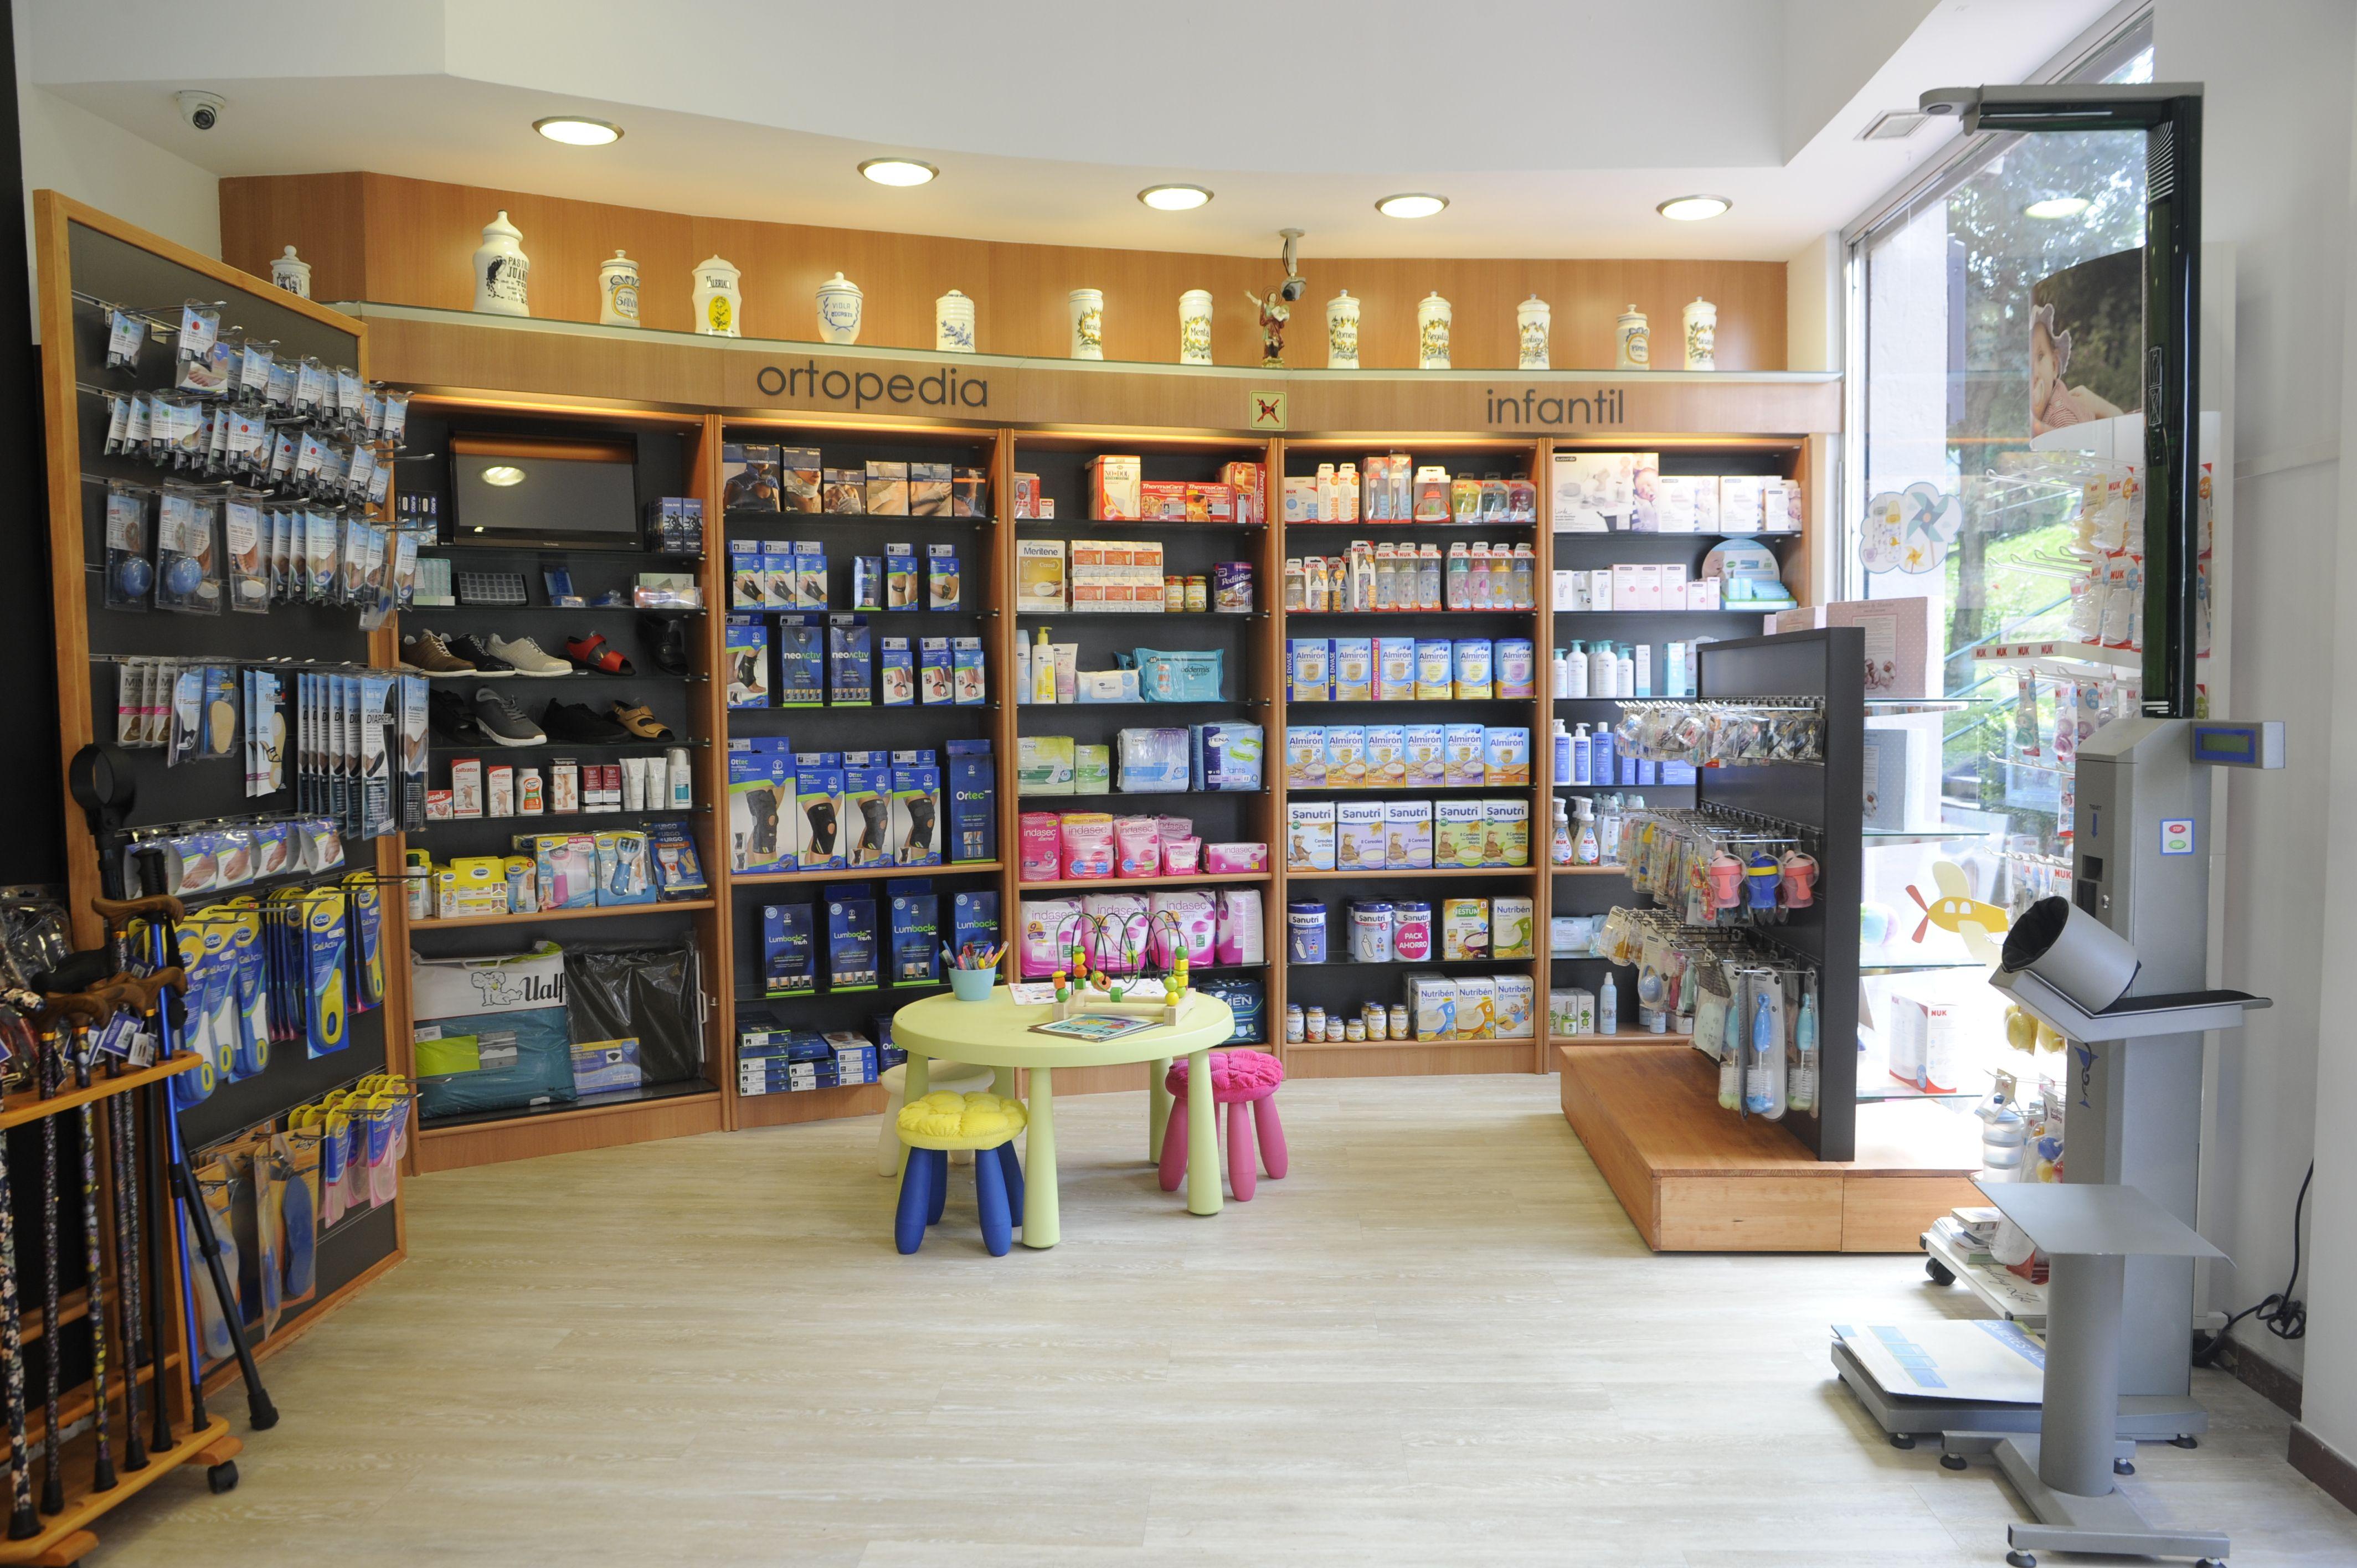 Foto 6 de Farmacia en Bilbao   Farmacia Socorro Rivas Castreje